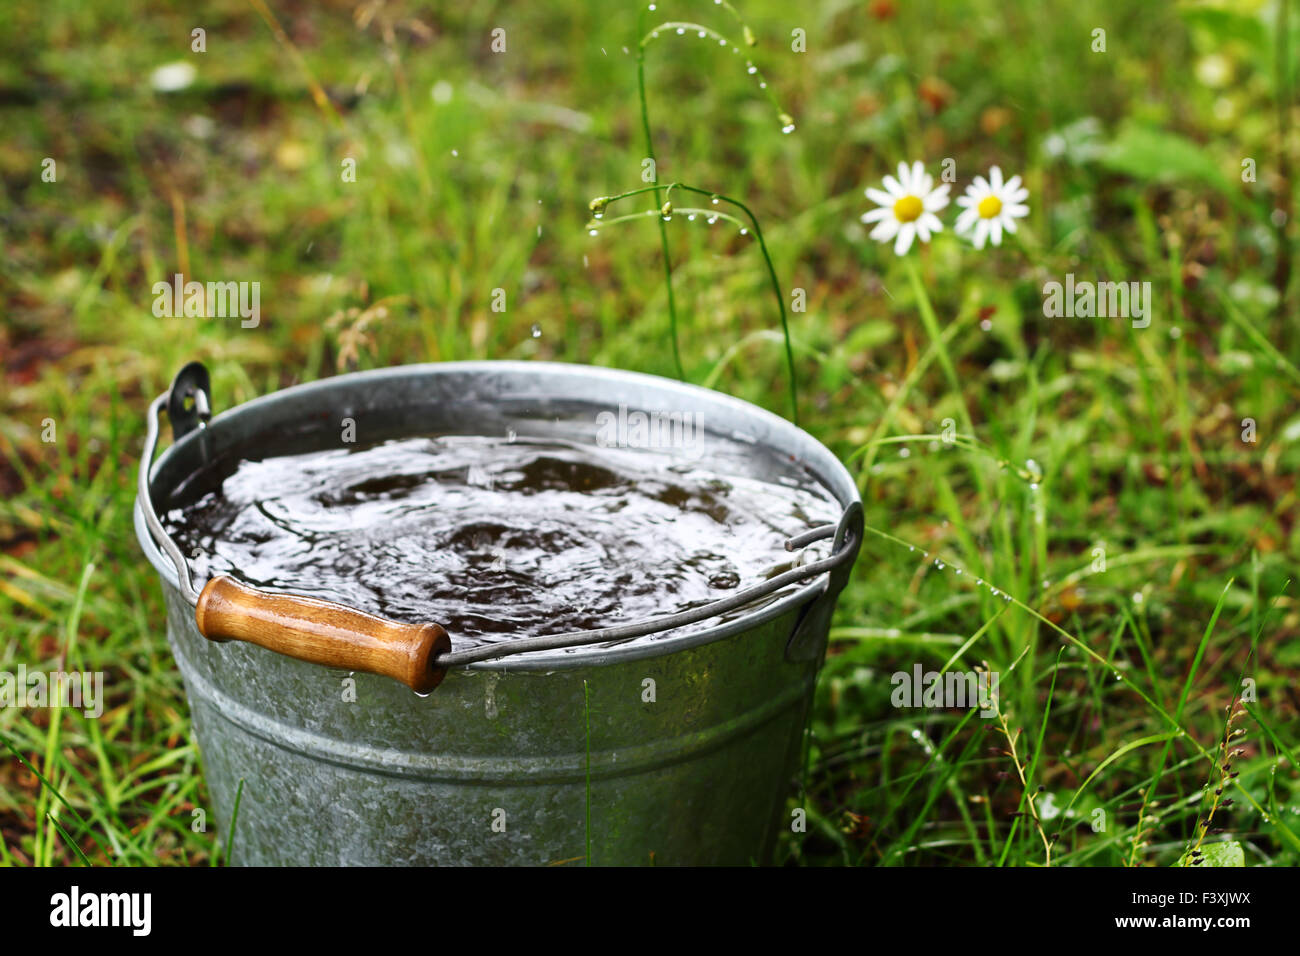 Summer rain - Stock Image